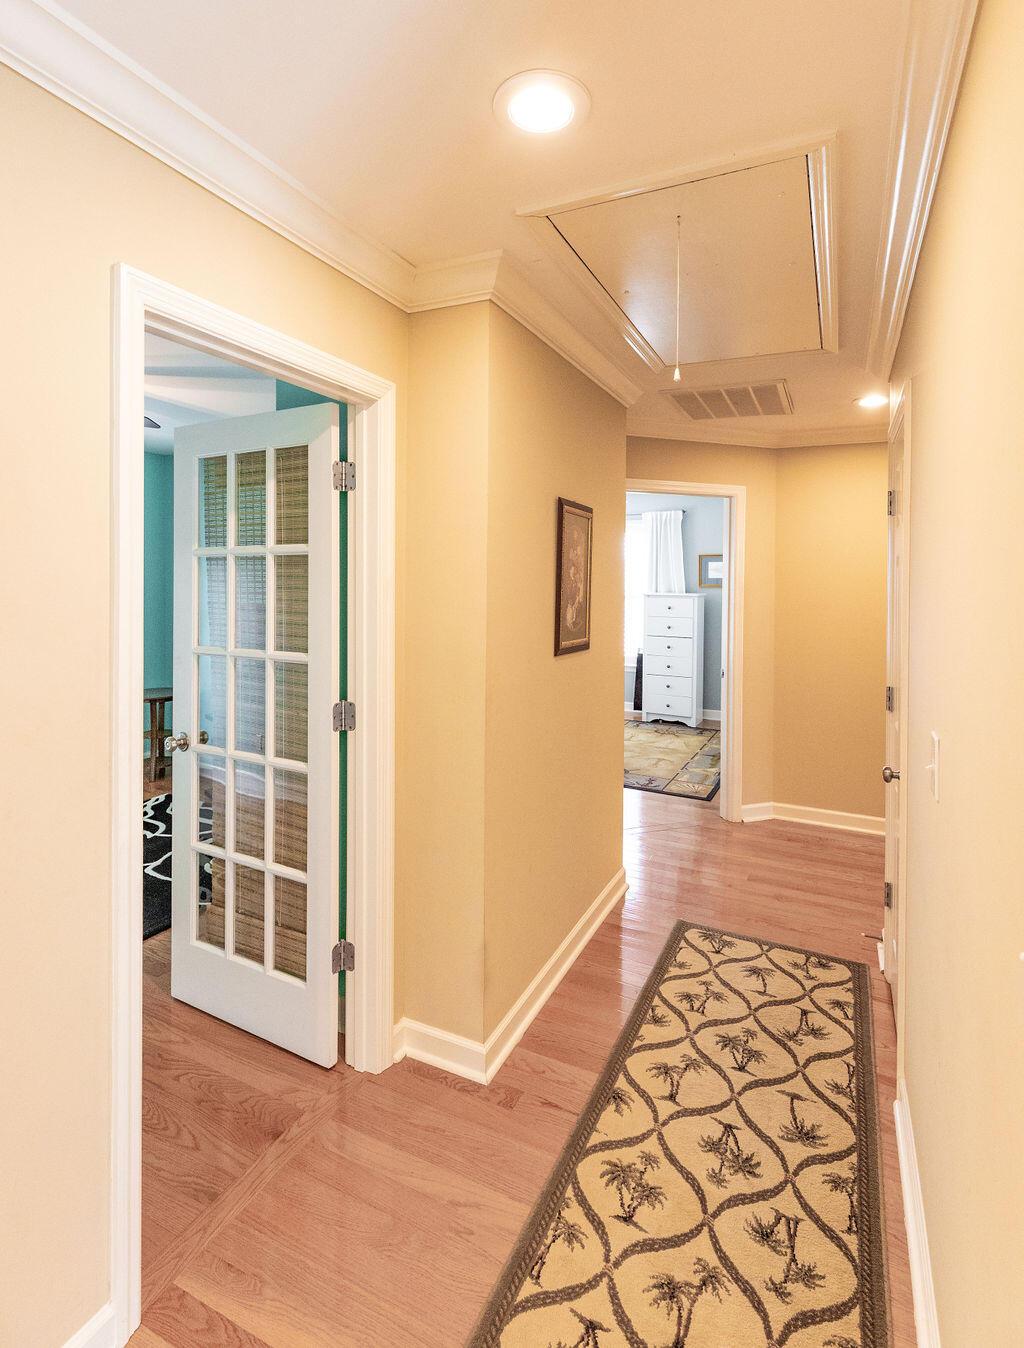 Dunes West Homes For Sale - 1220 Darts Cove, Mount Pleasant, SC - 31